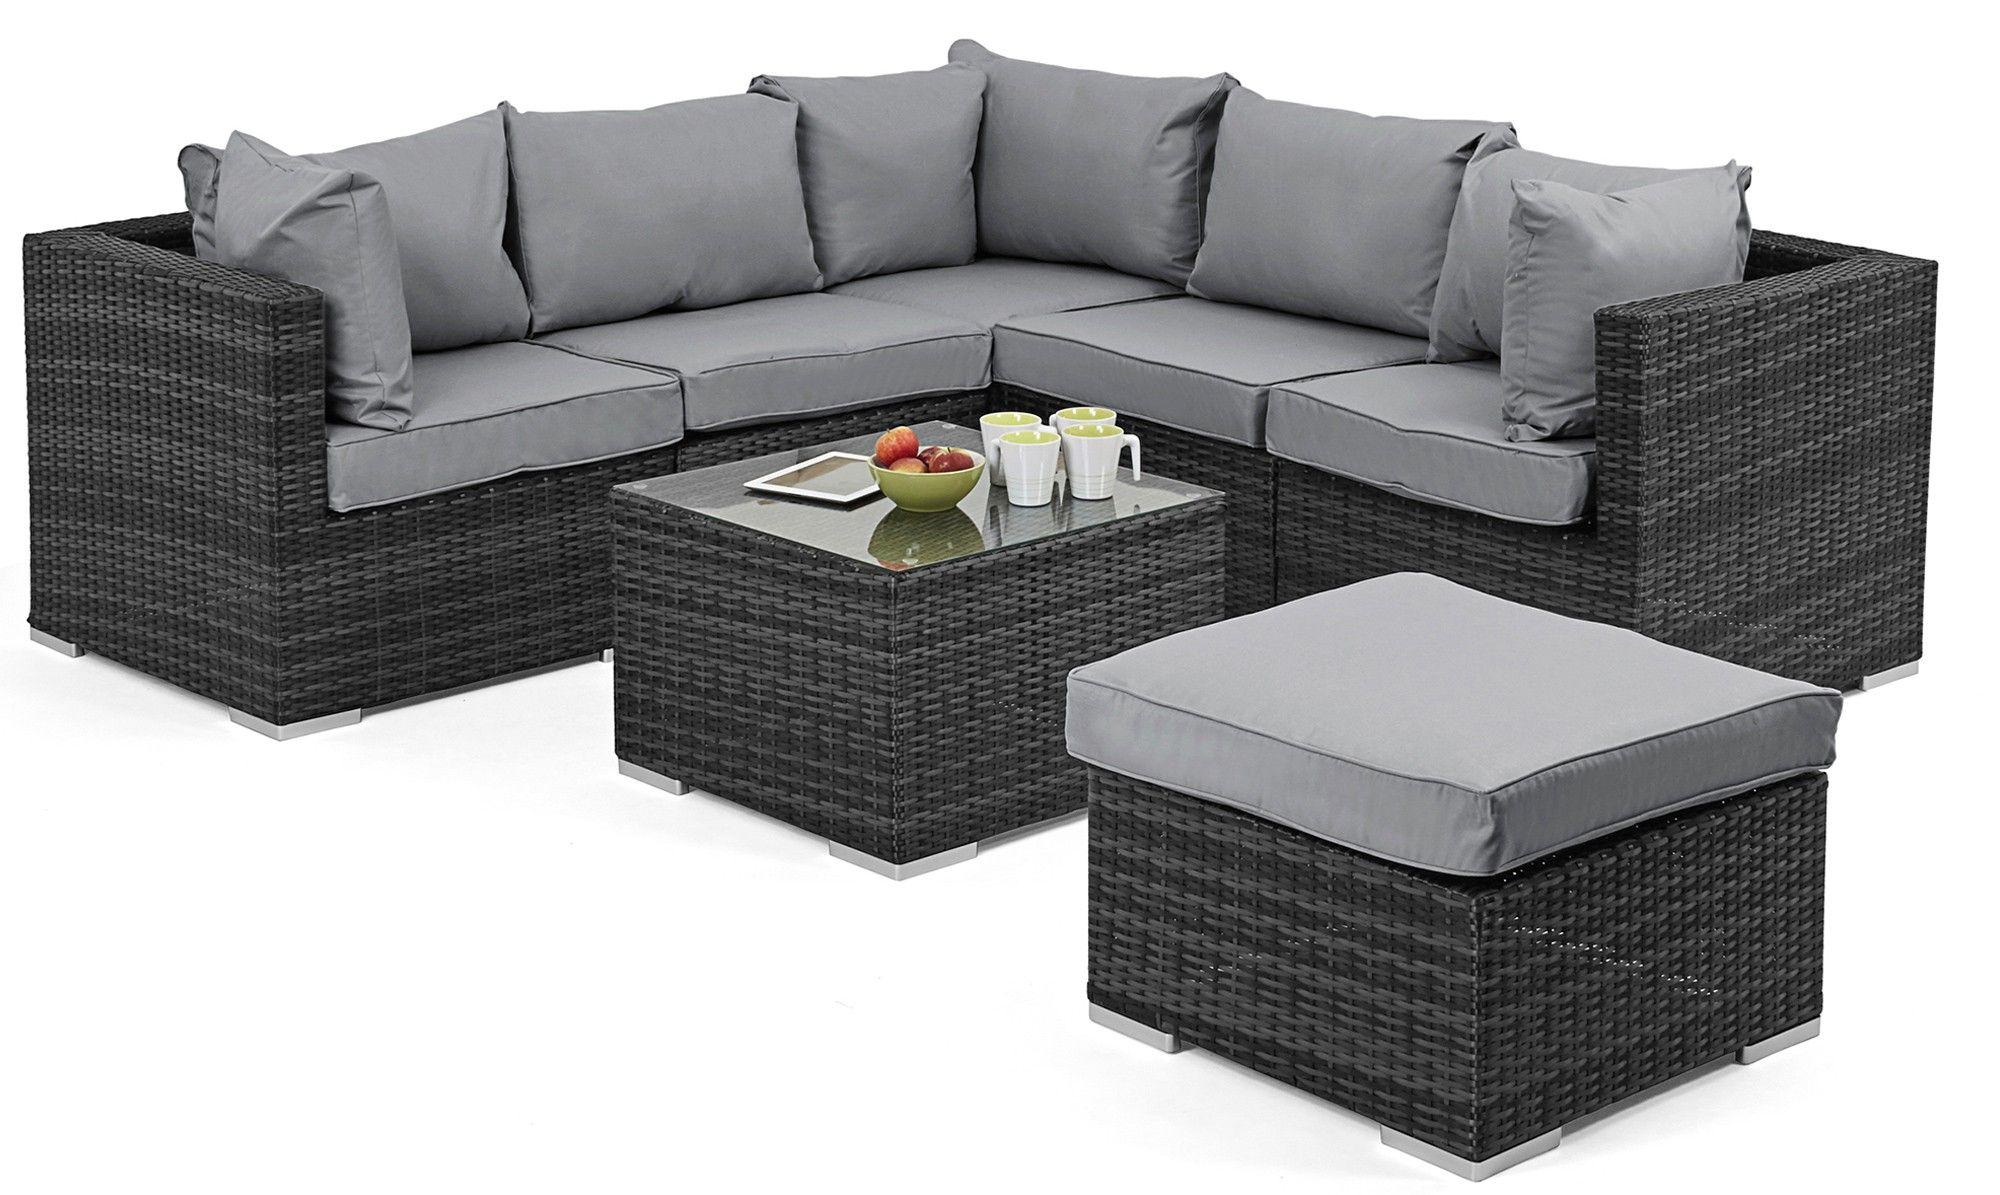 royalcraft cannes small black rattan corner sofa leather sofas cheap set 5 piece